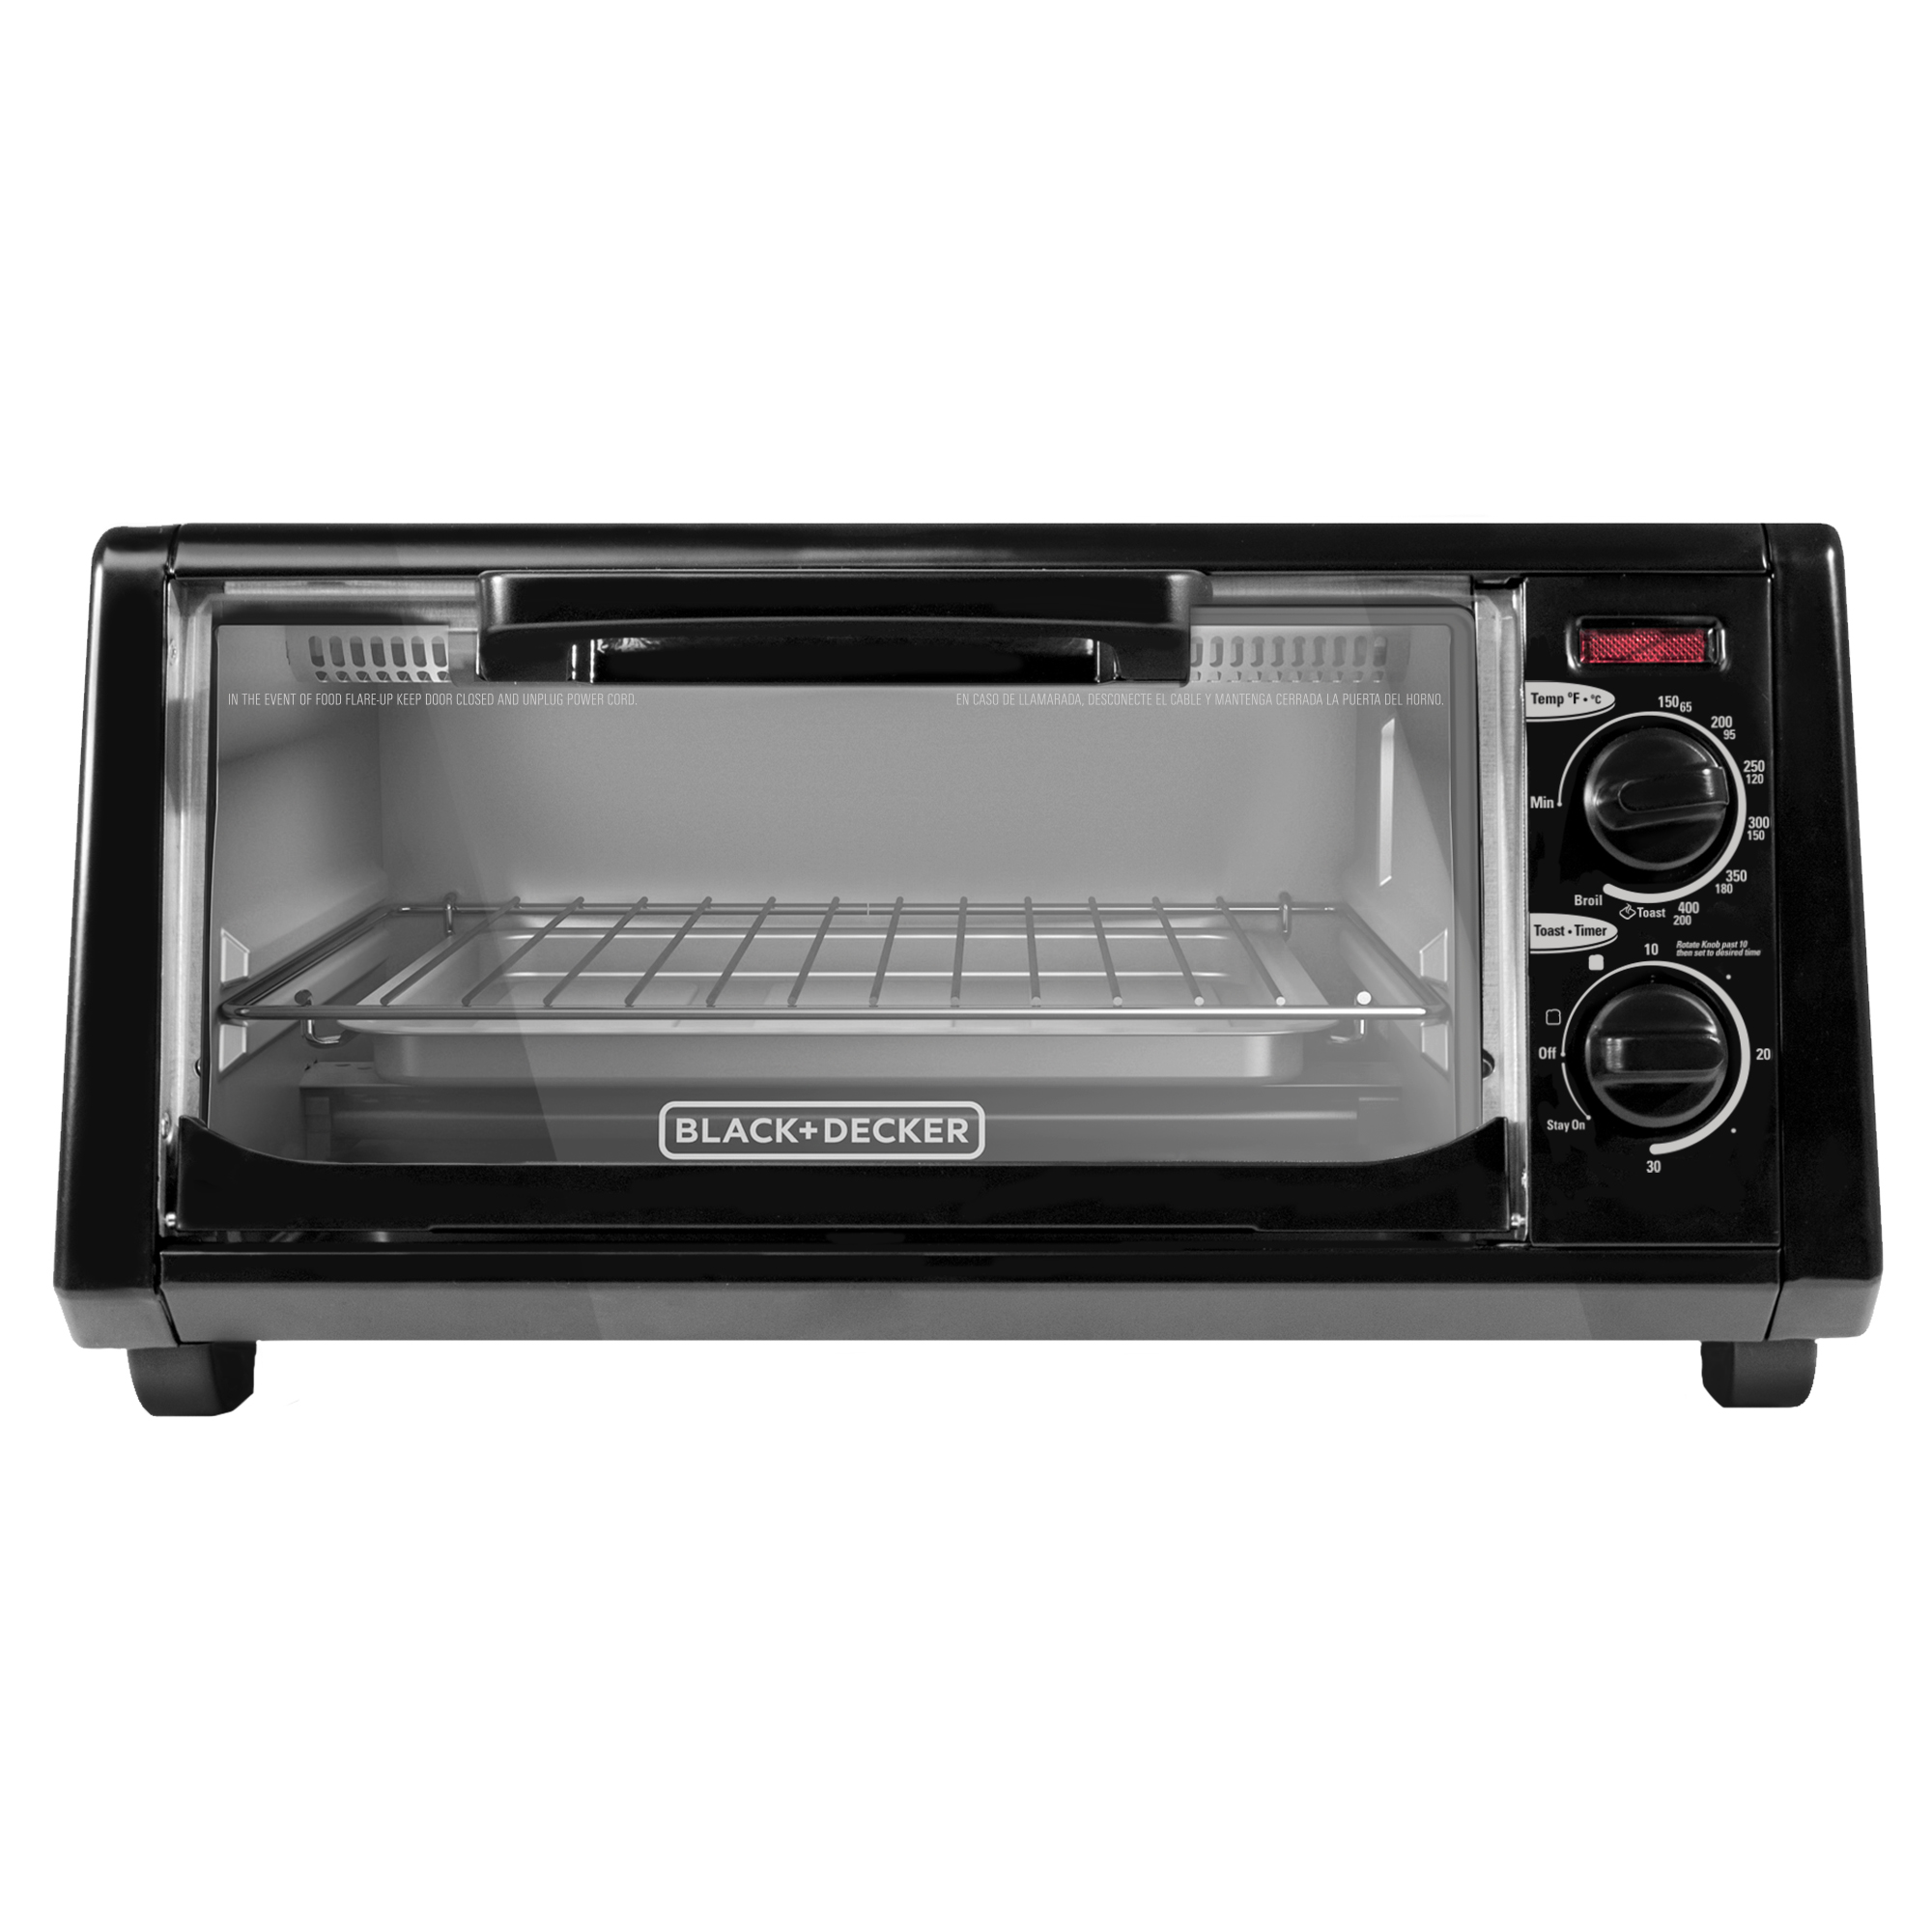 Black Decker To1200b 4 Slice Toaster Oven